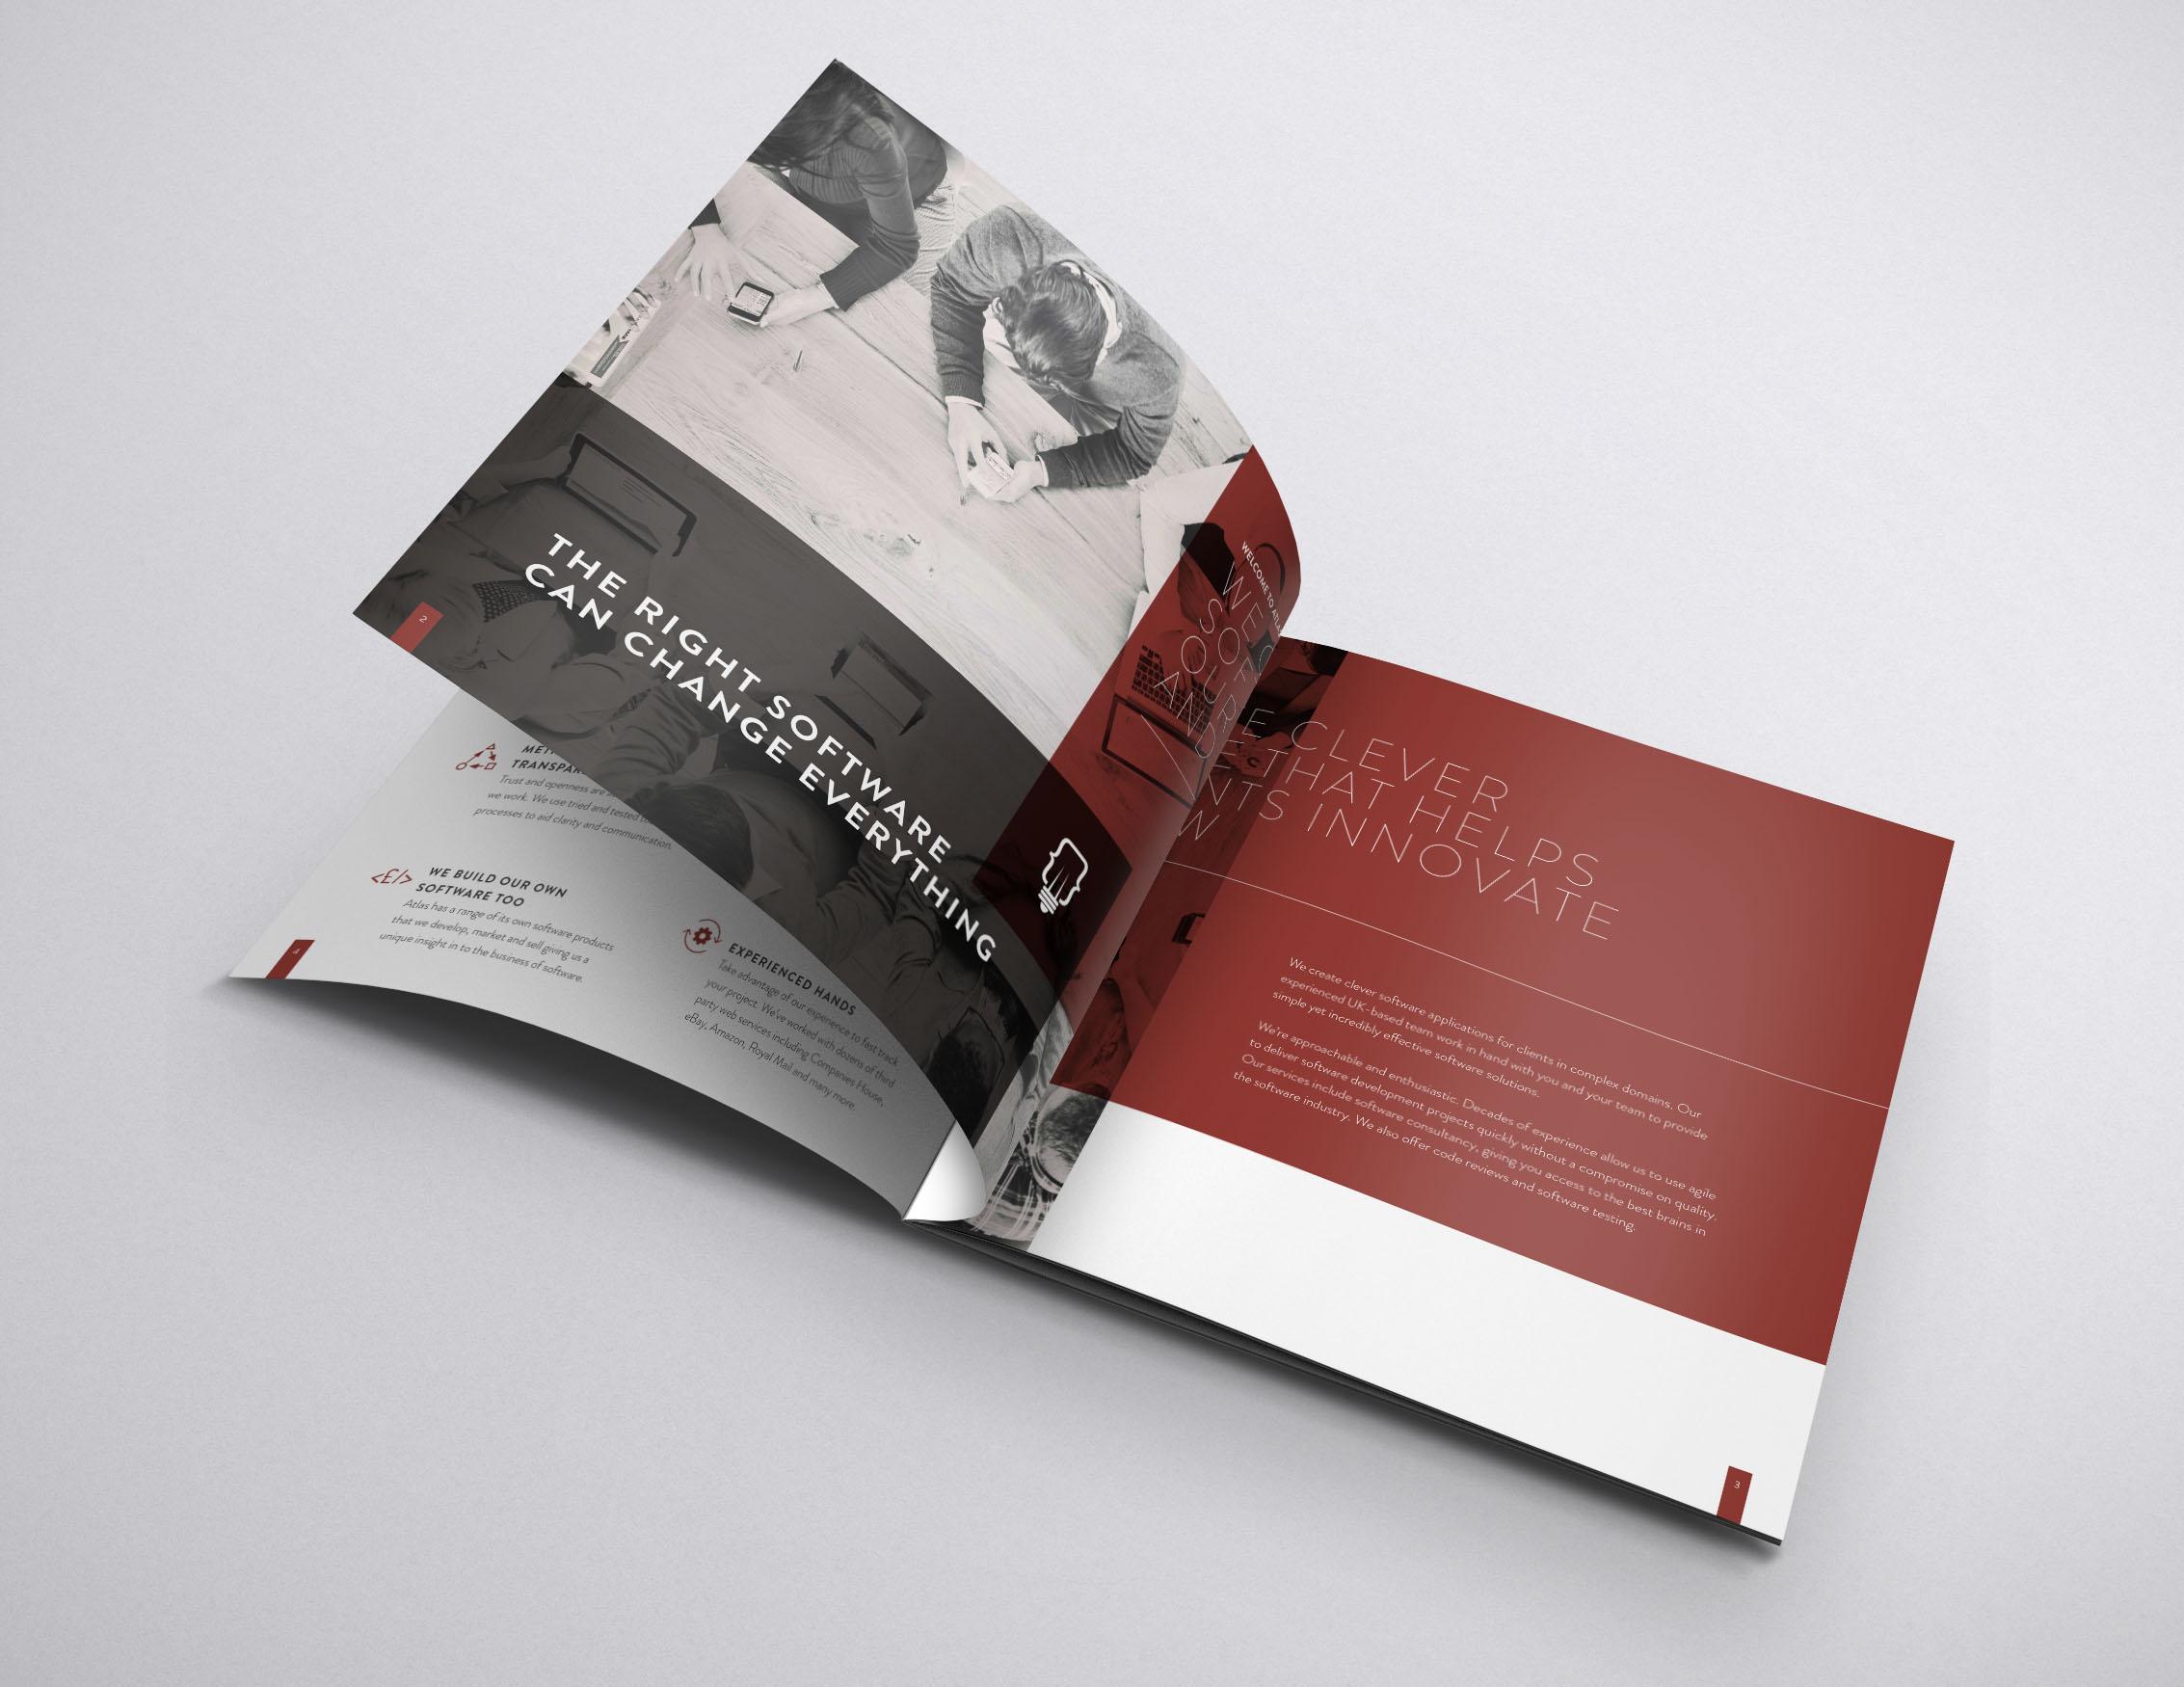 Atlas Code Case Study | Design Thing